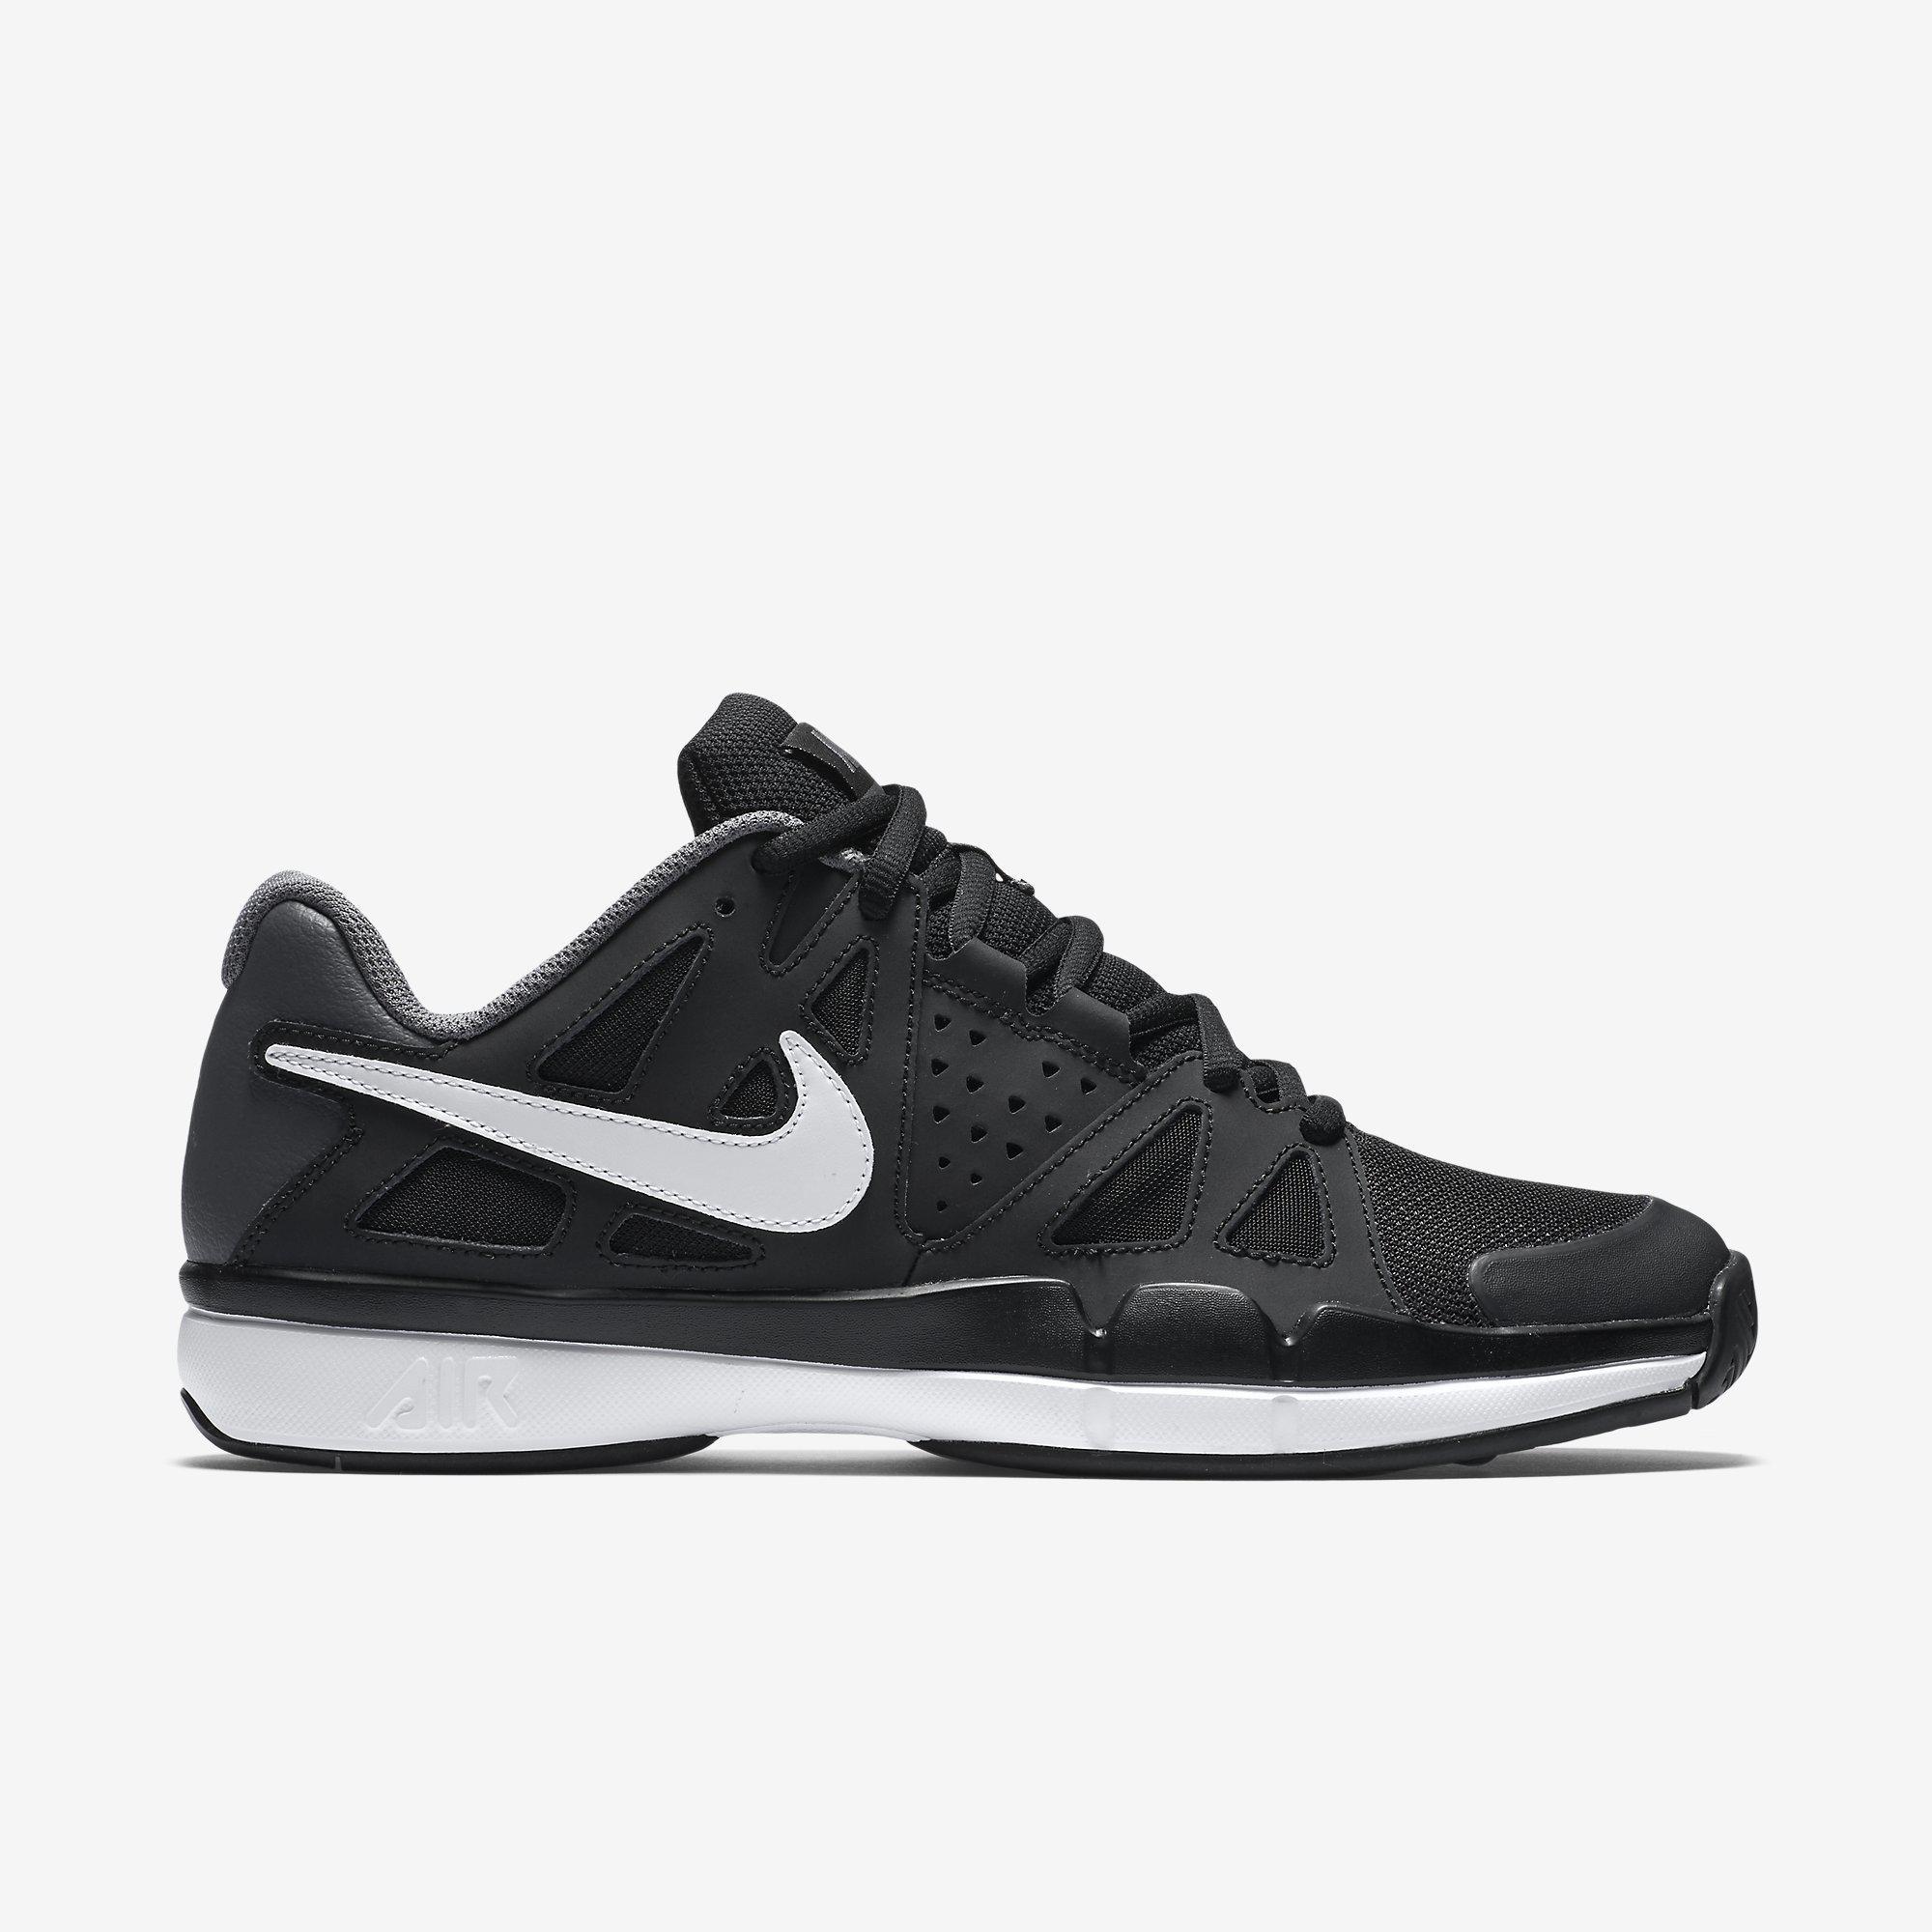 Nike Mens Air Vapor Advantage Tennis Shoes - Black/White